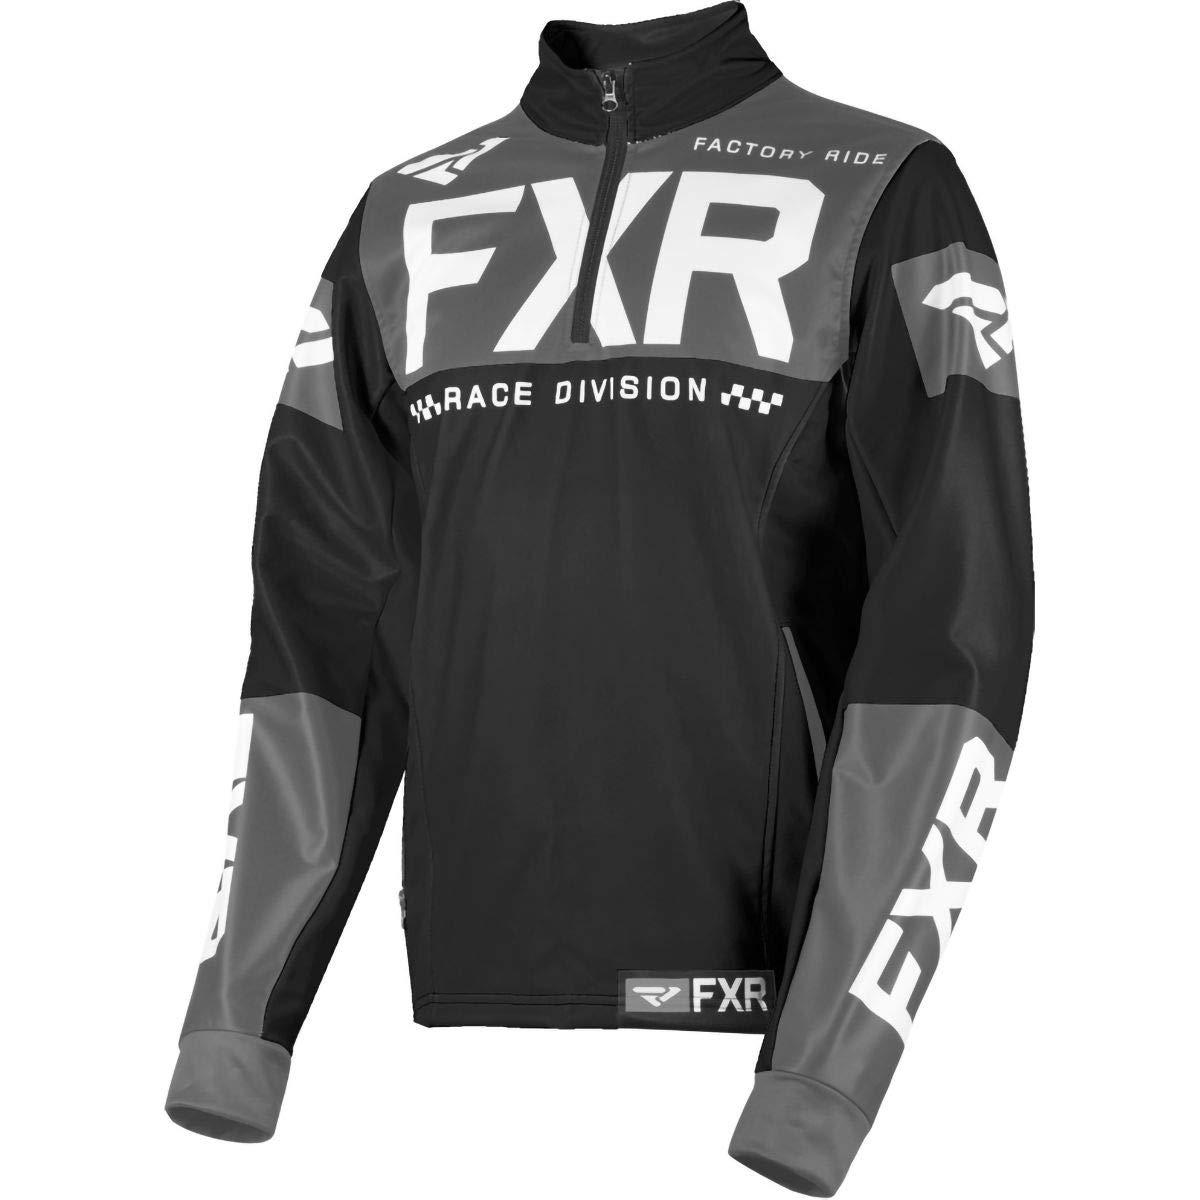 Medium FXR 2019 Cold Cross RR Pullover Orange//Black//White